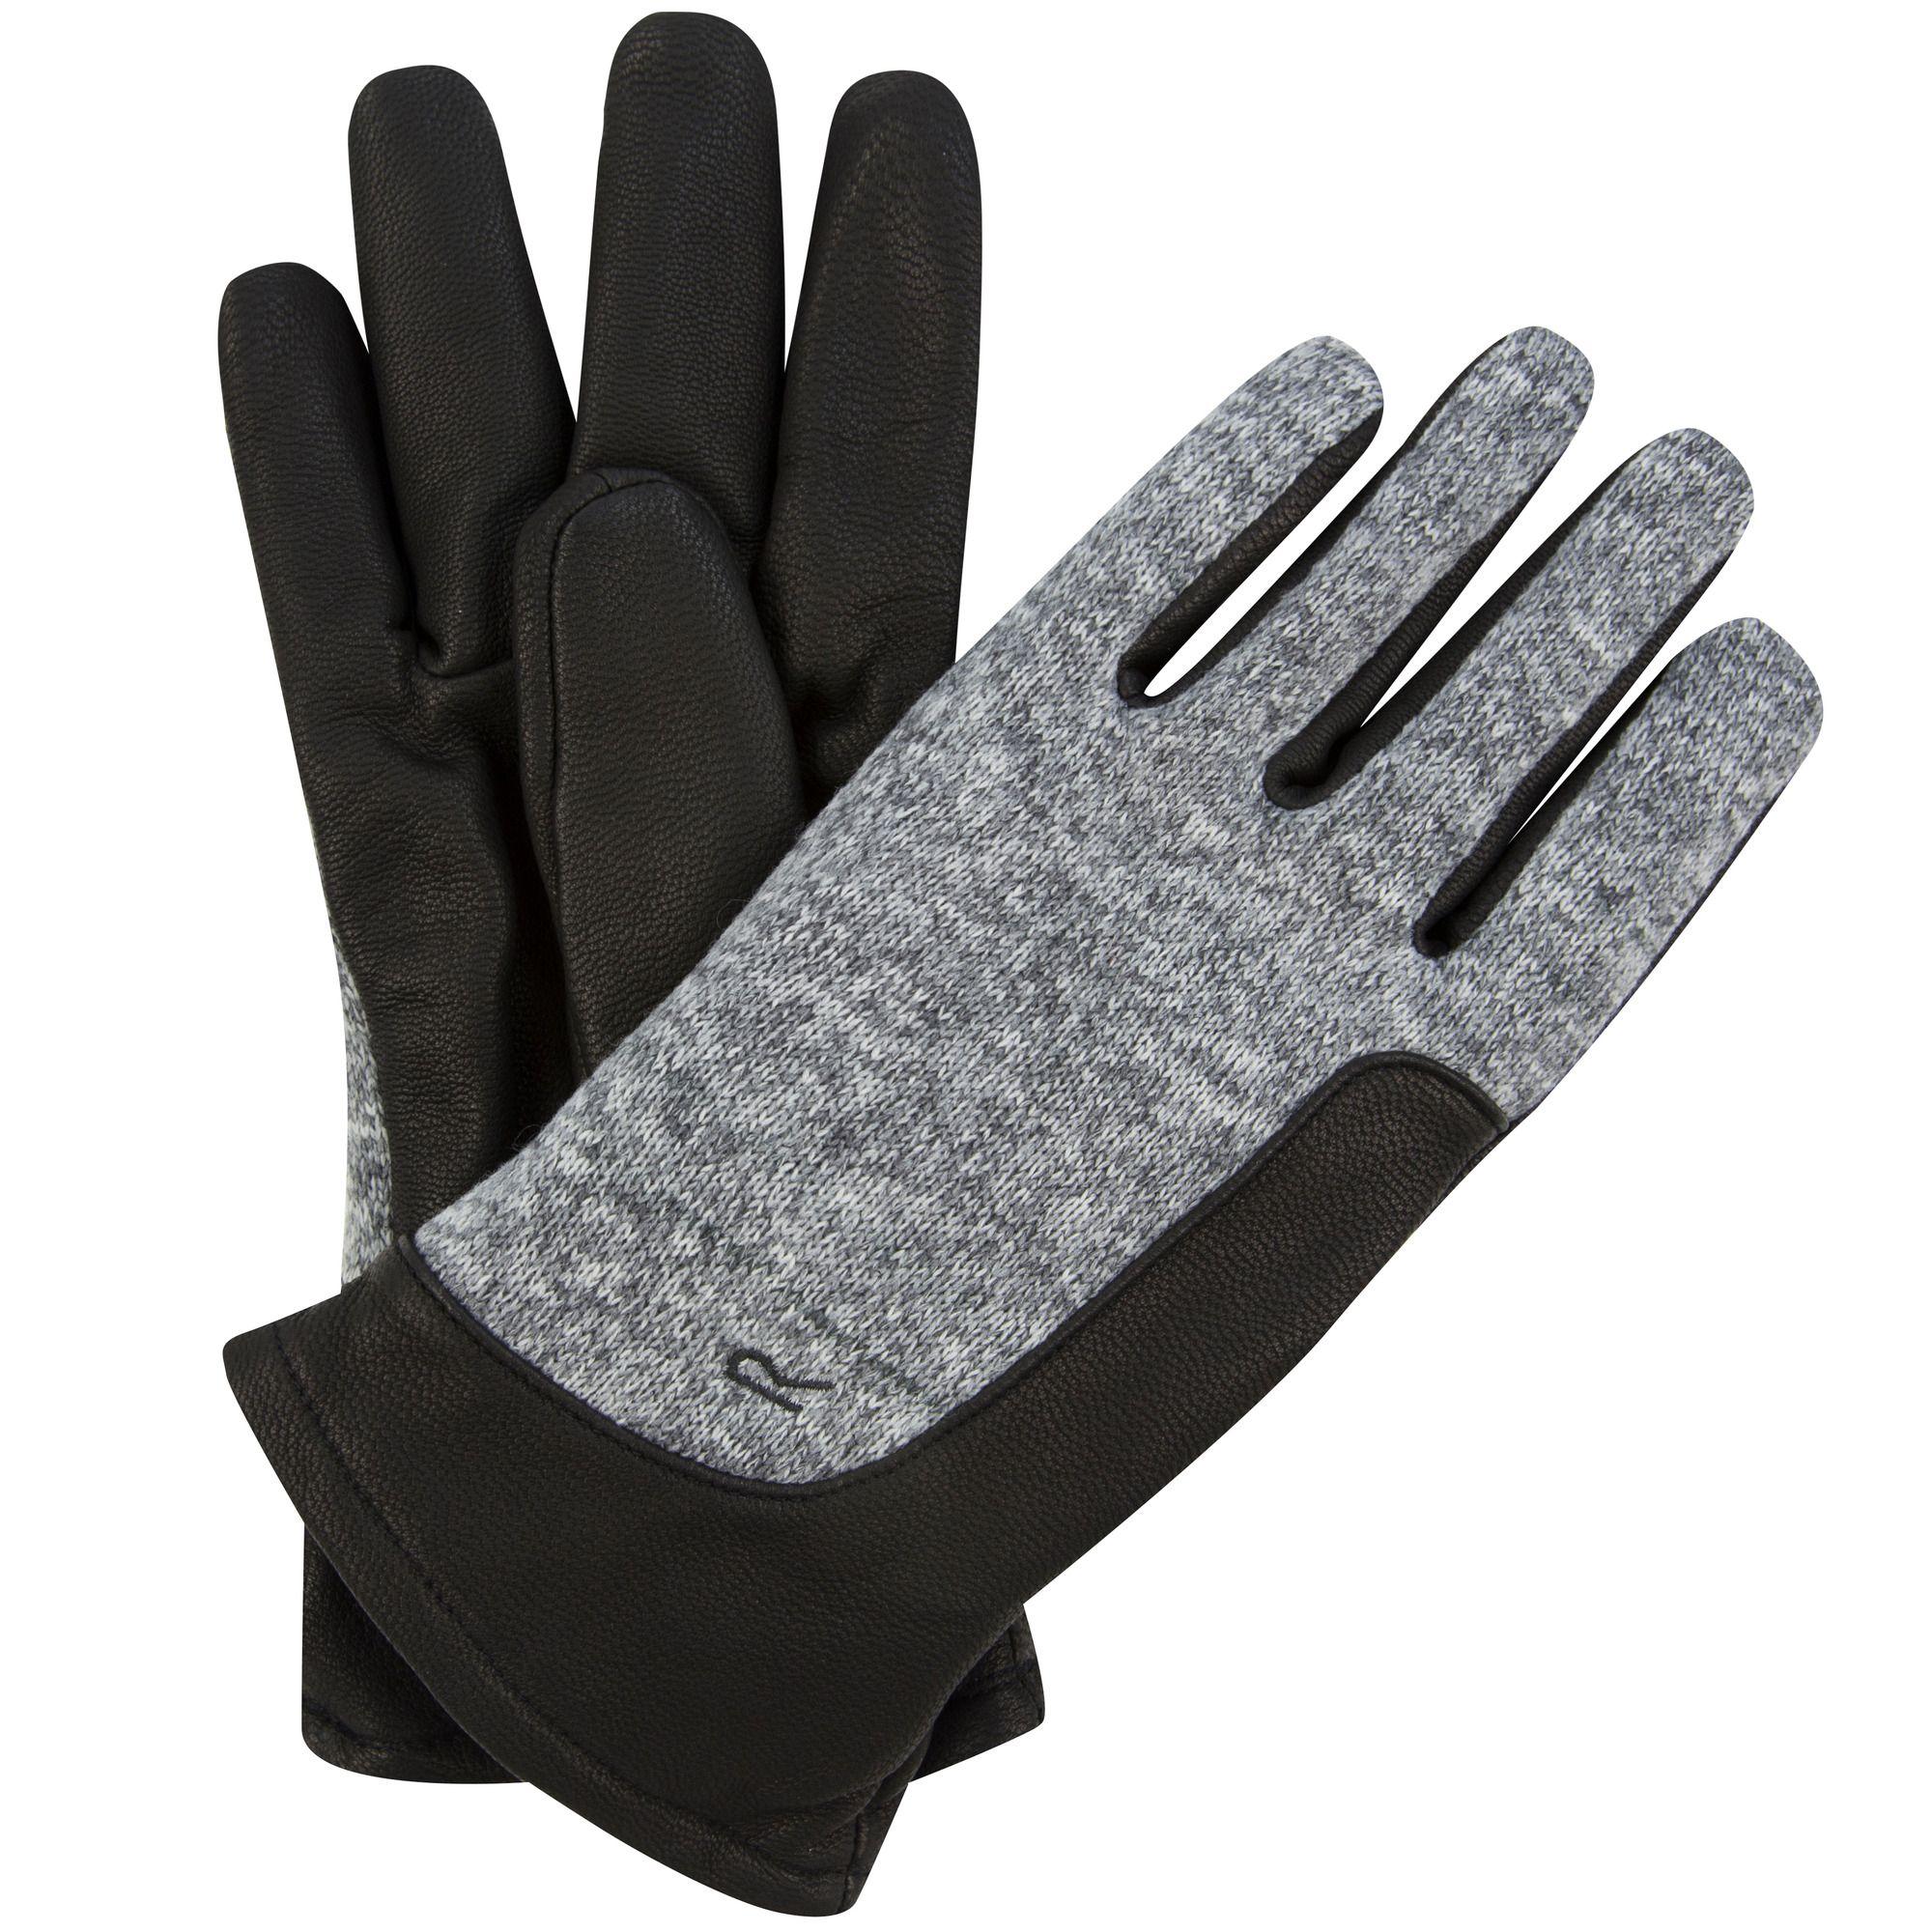 Regatta Lederhandschuhe Herren Gerson | Accessoires > Handschuhe > Lederhandschuhe | Regatta